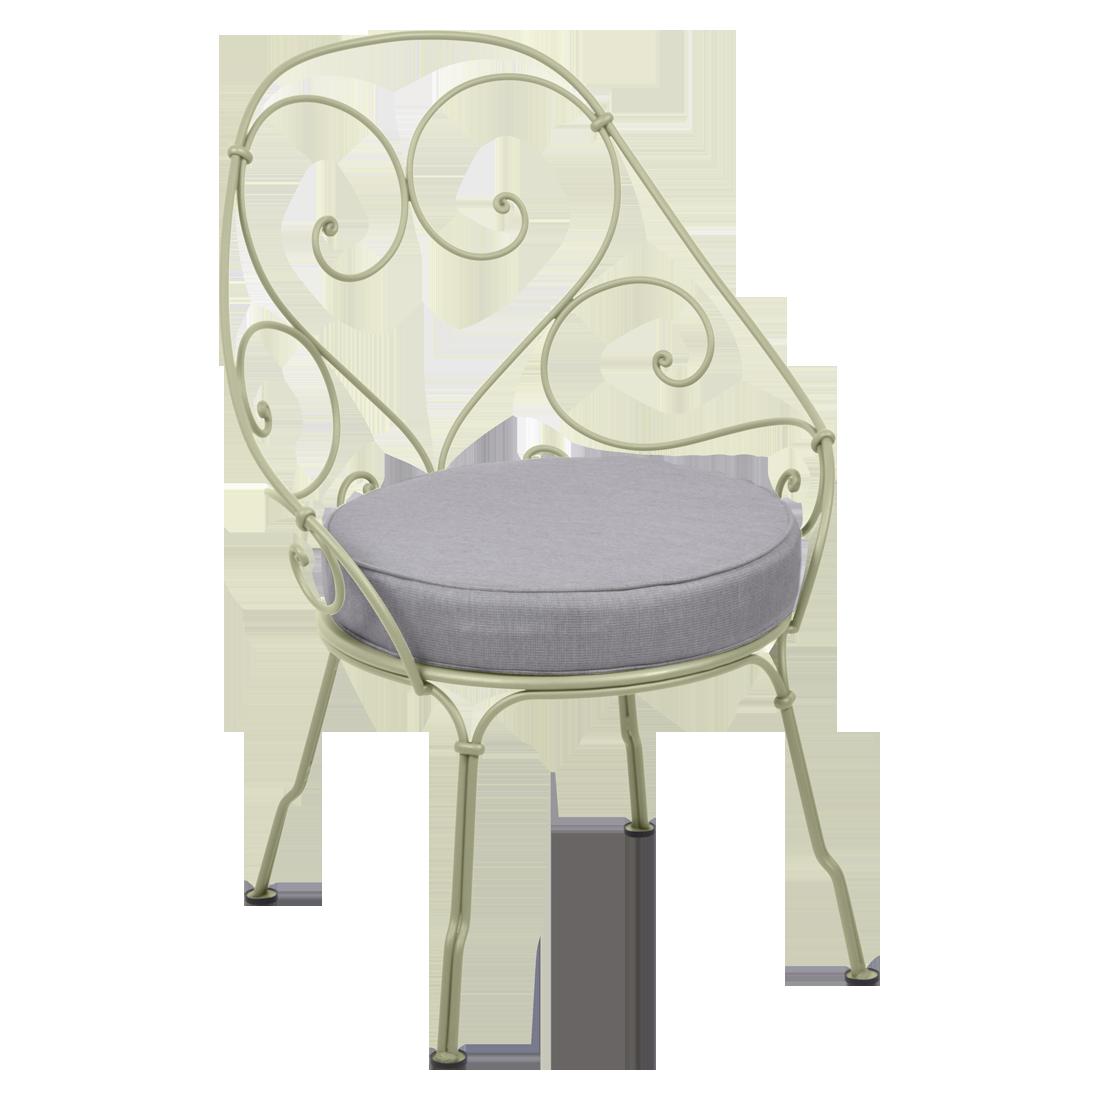 fauteuil de jardin, fauteuil volute, fauteuil fermob, fauteuil vert